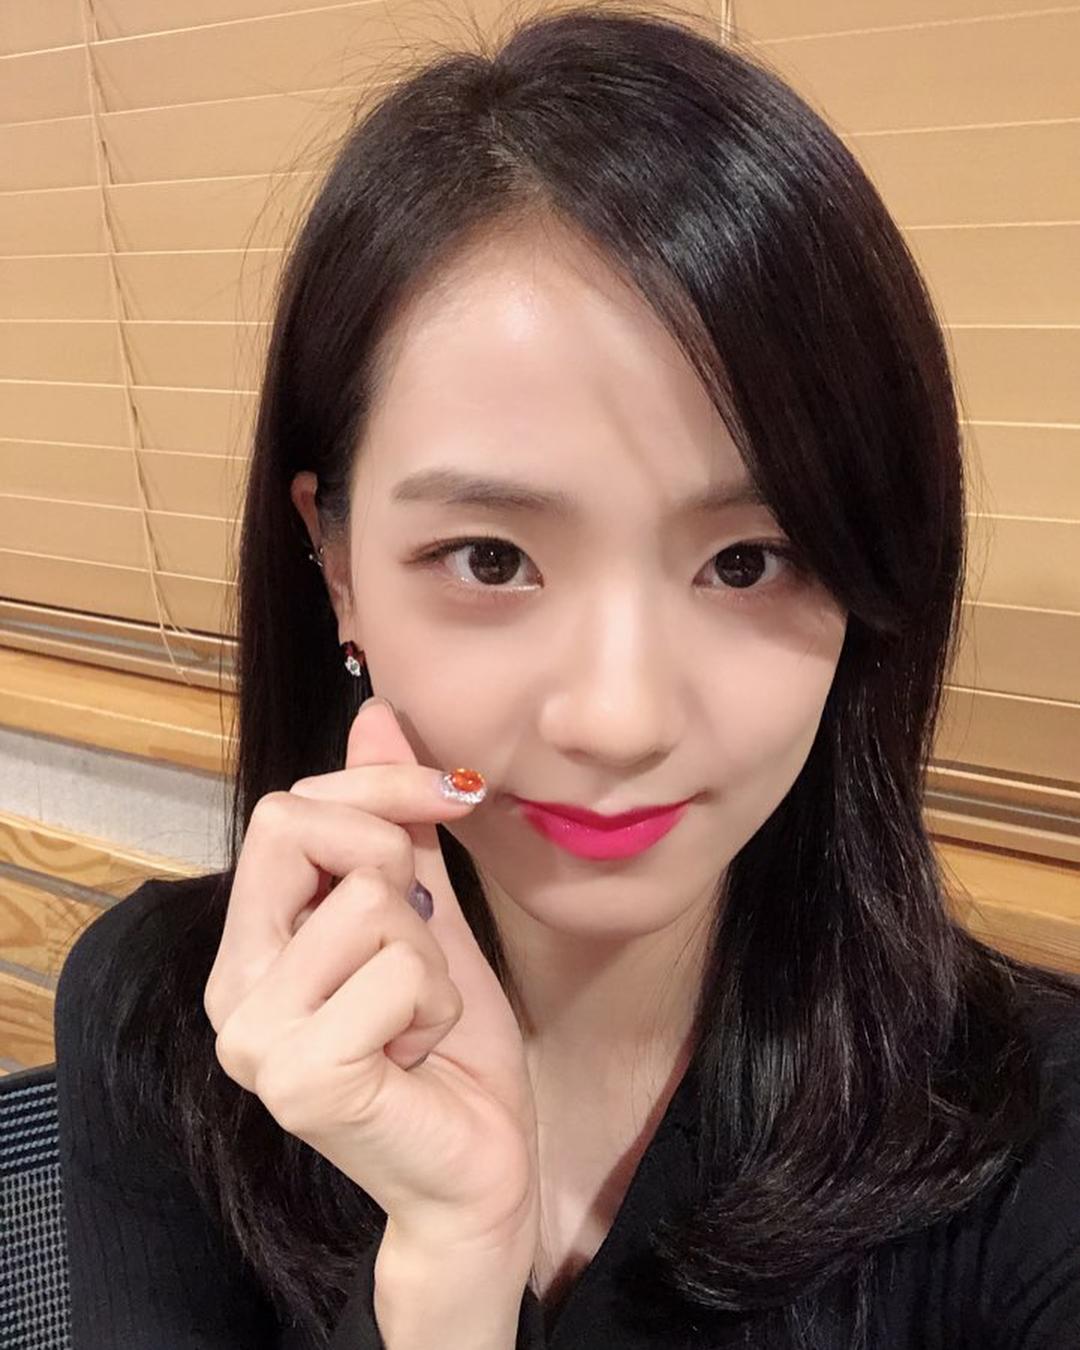 Jisoo has the best tips for the best selfies